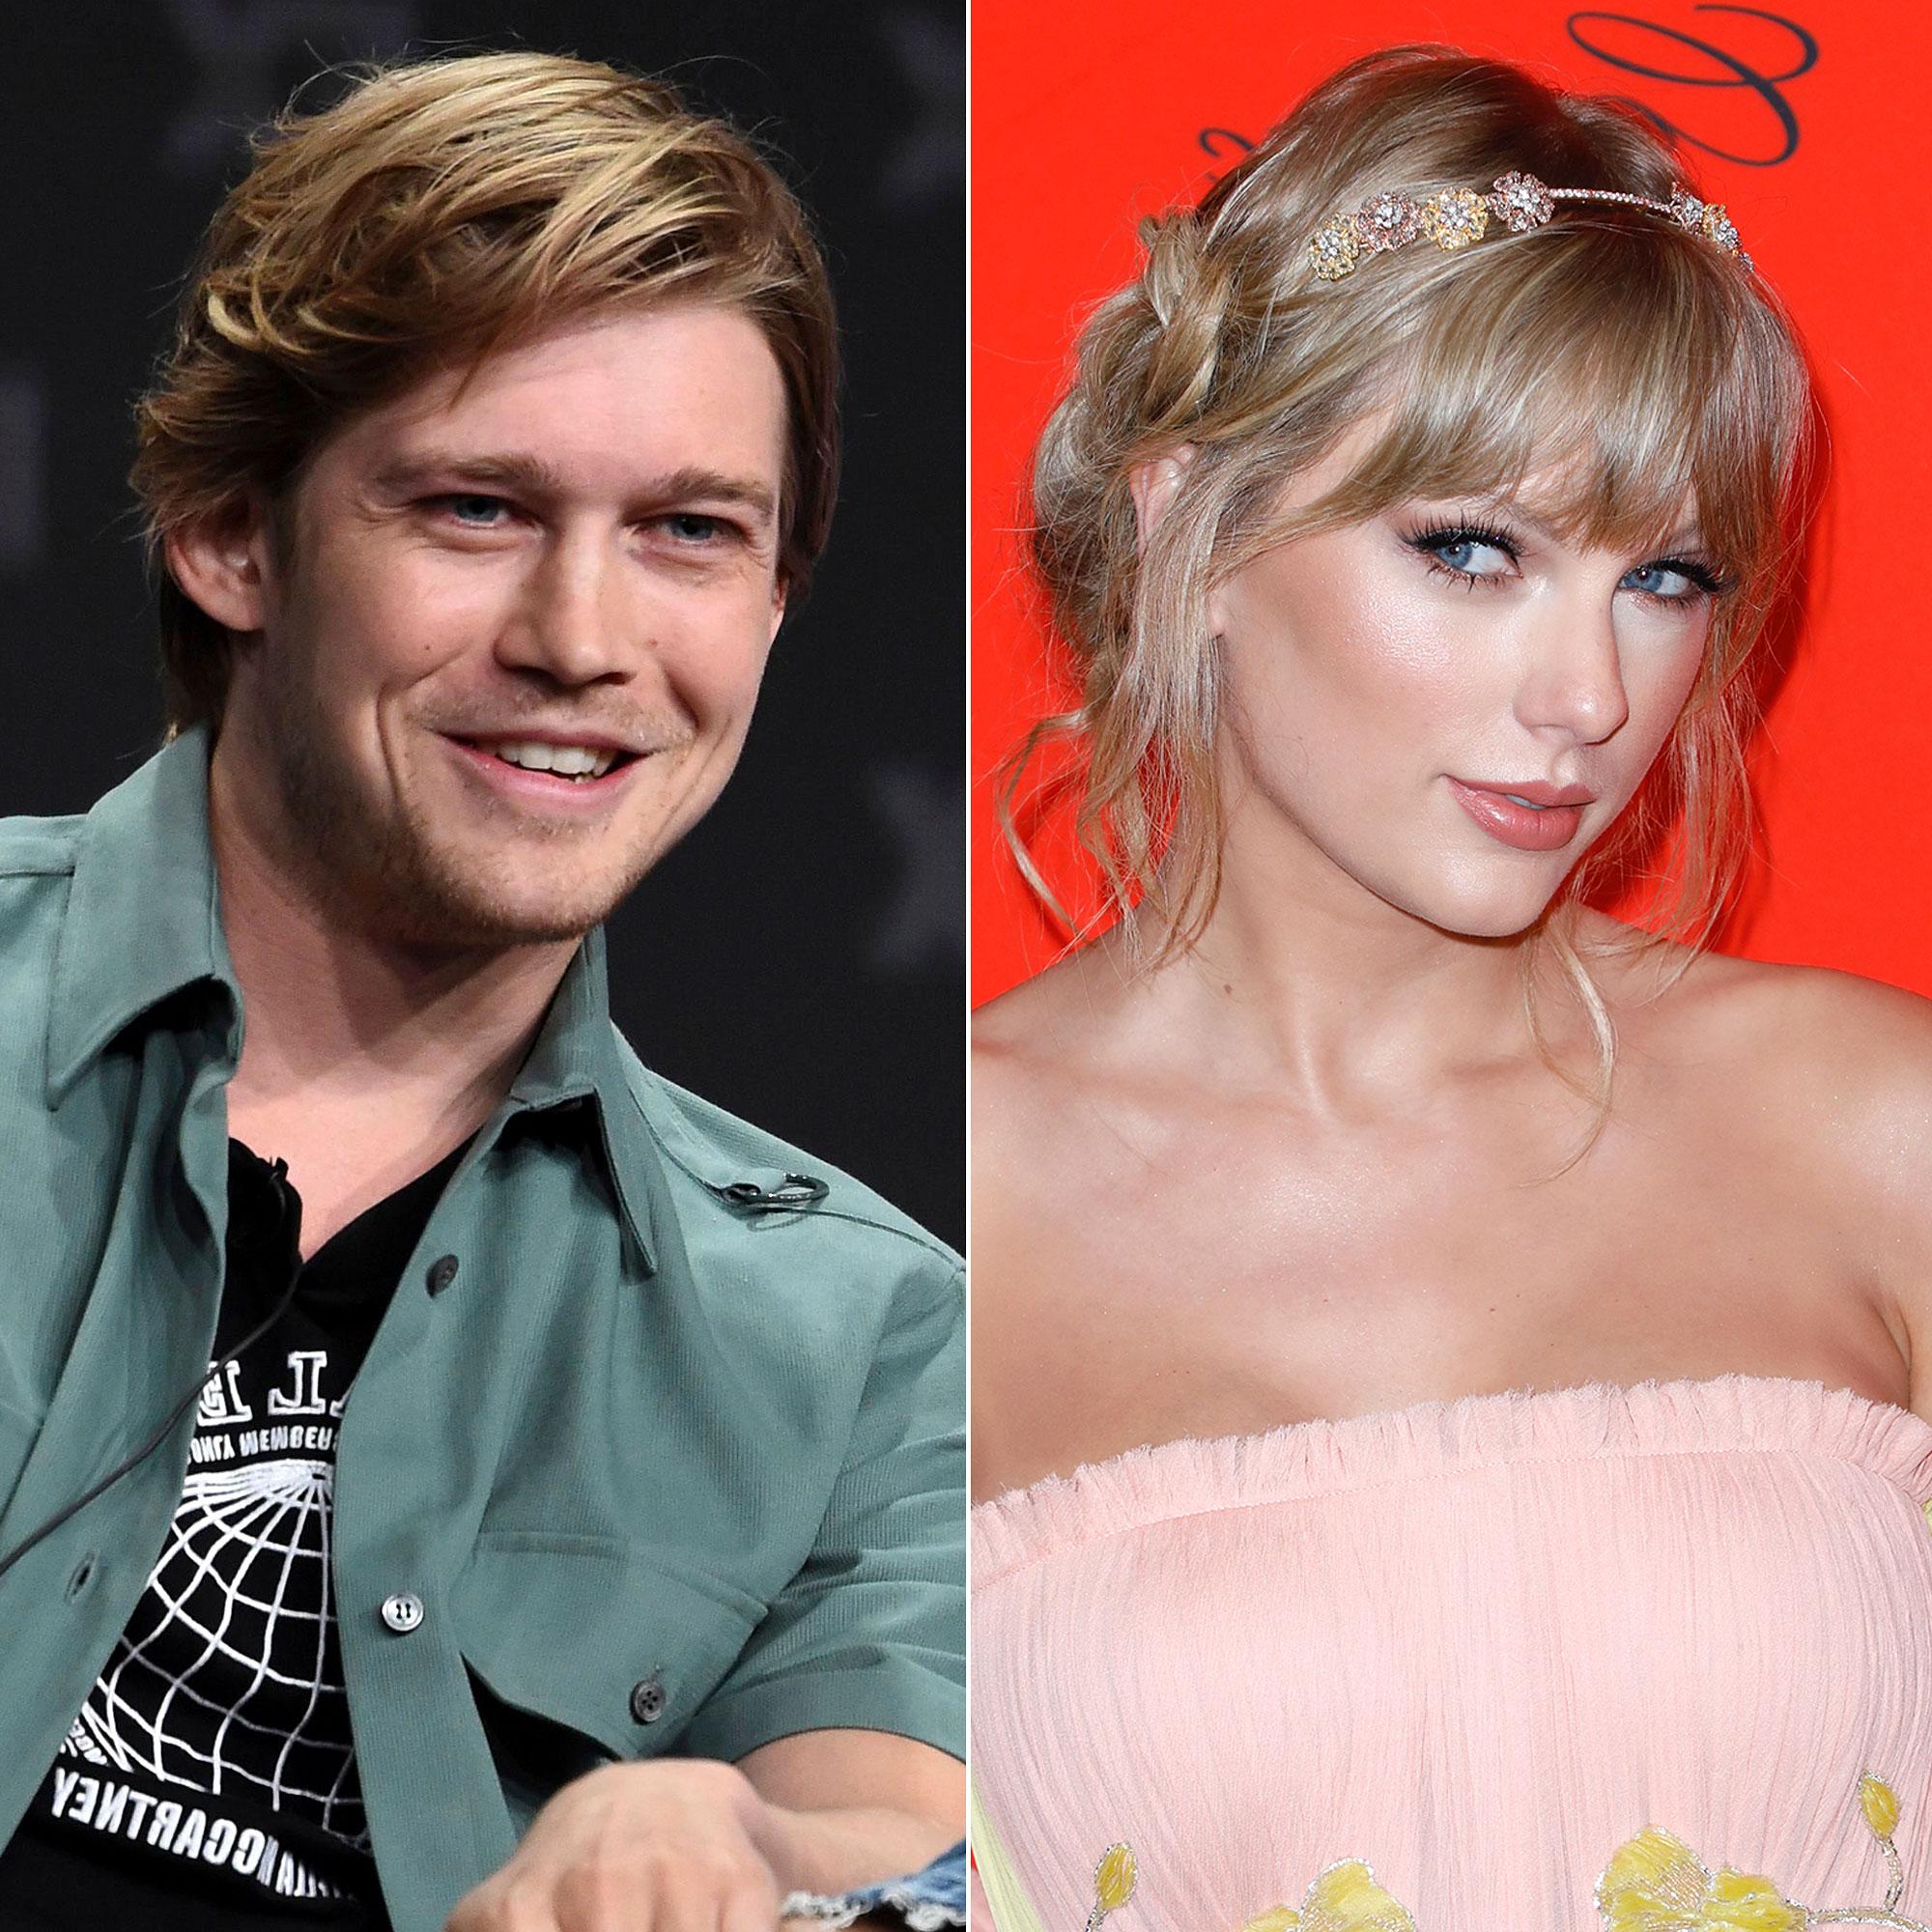 Joe Alwyn Has Been Taylor Swift's 'Rock' During a 'Tough Year'